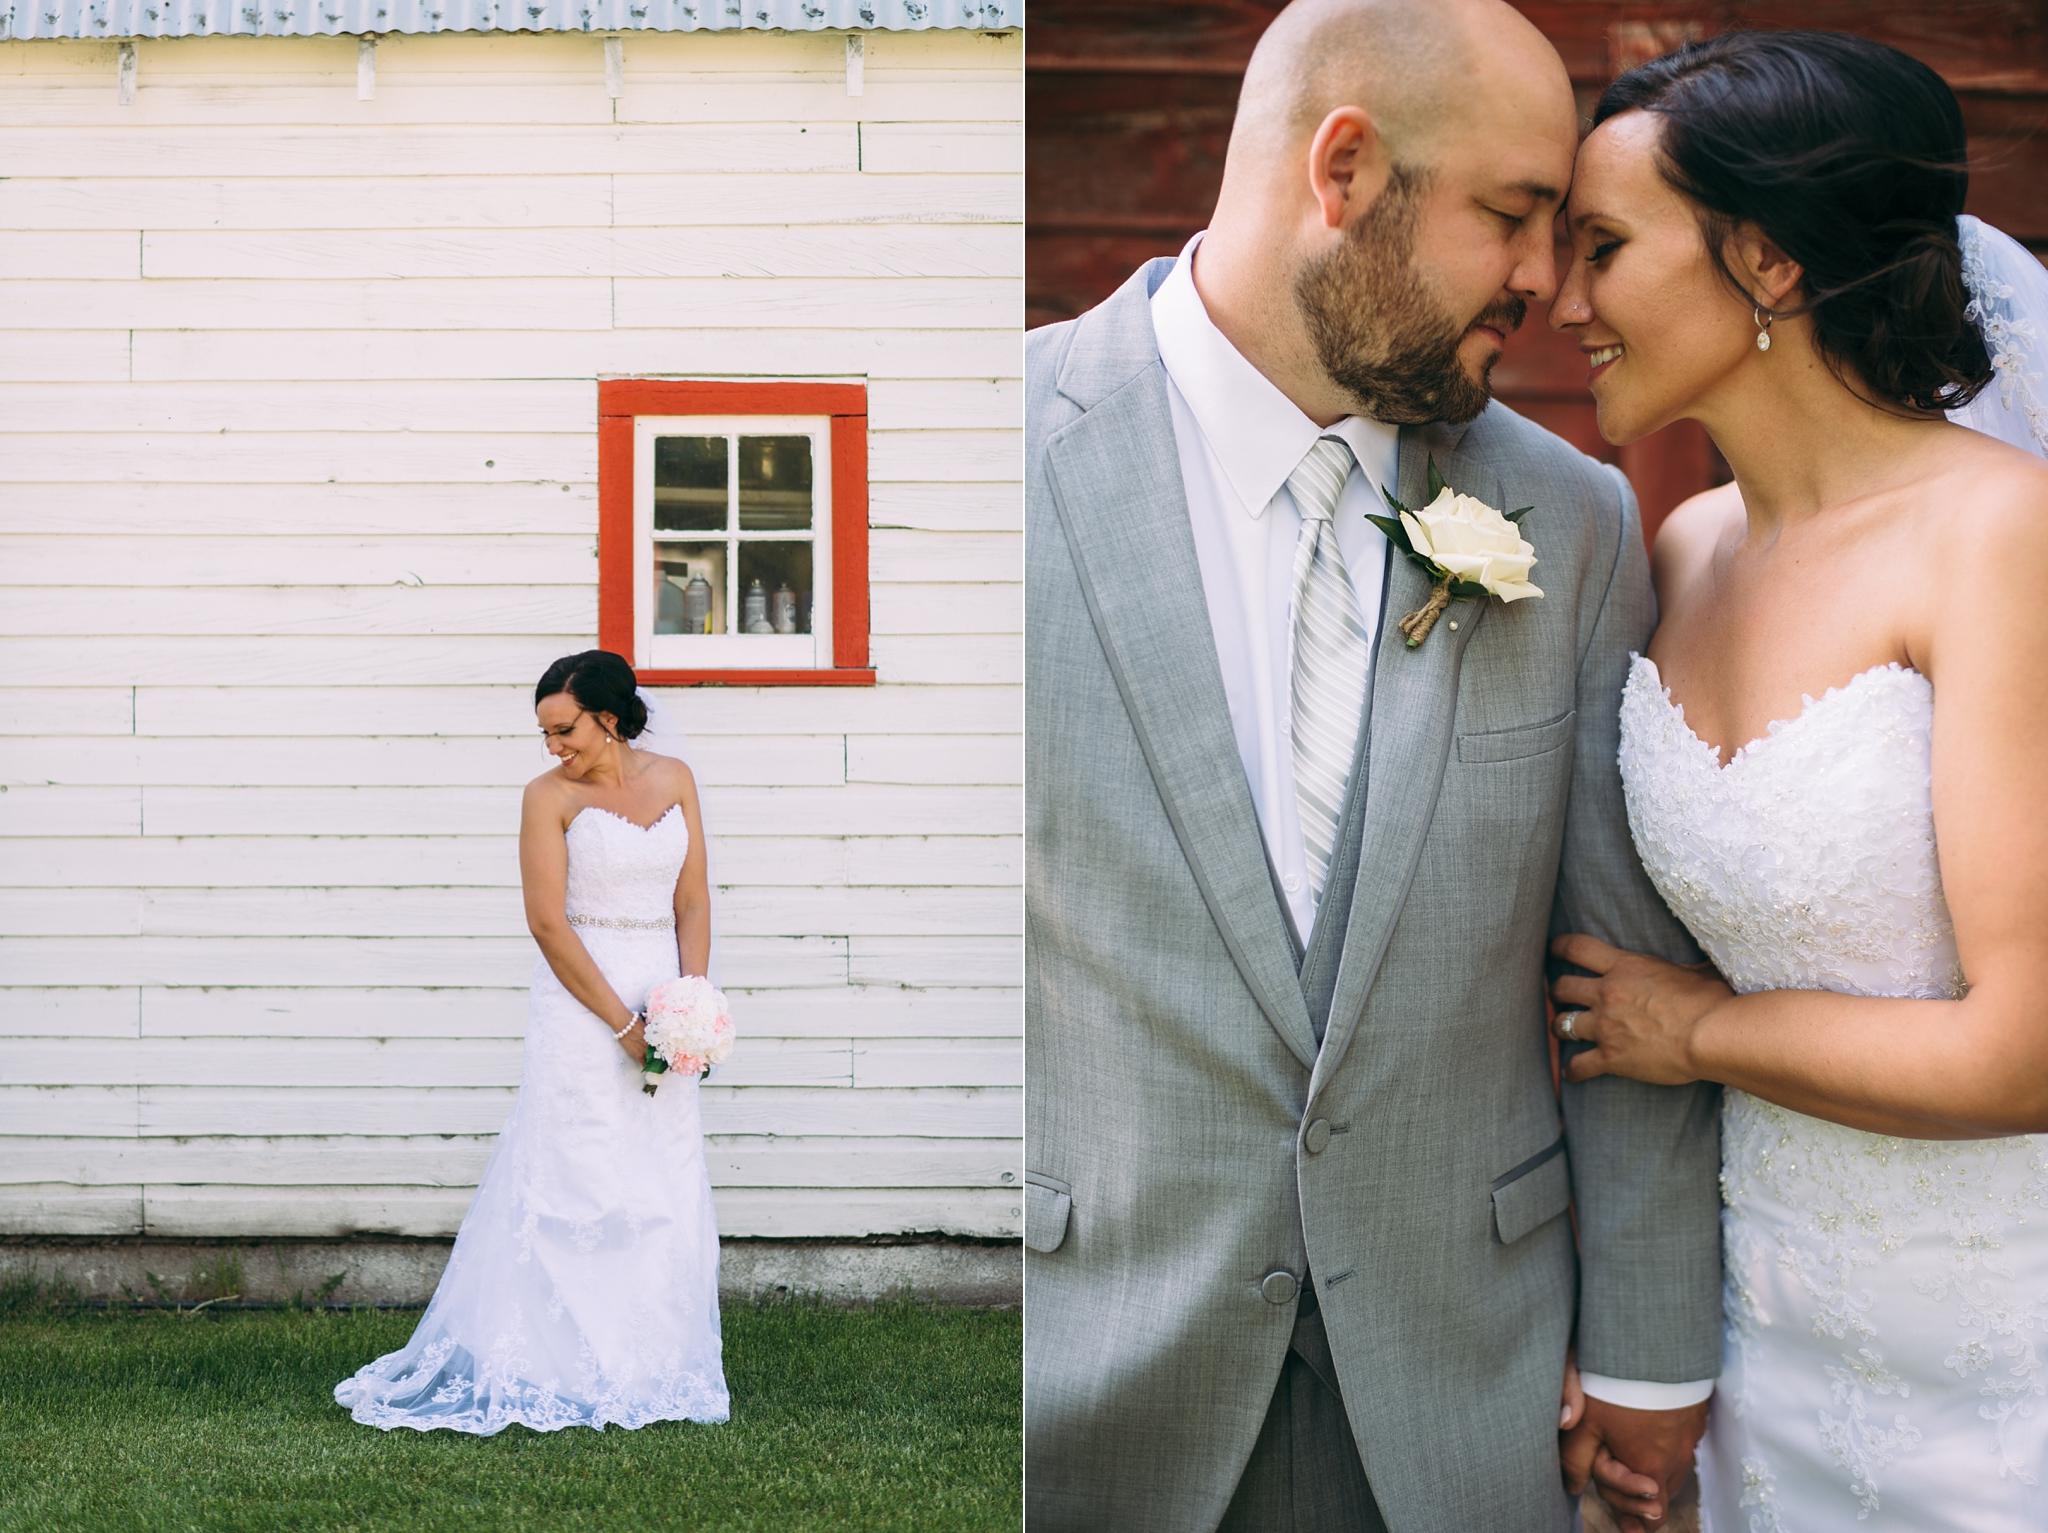 kaihla_tonai_intimate_wedding_elopement_photographer_1544